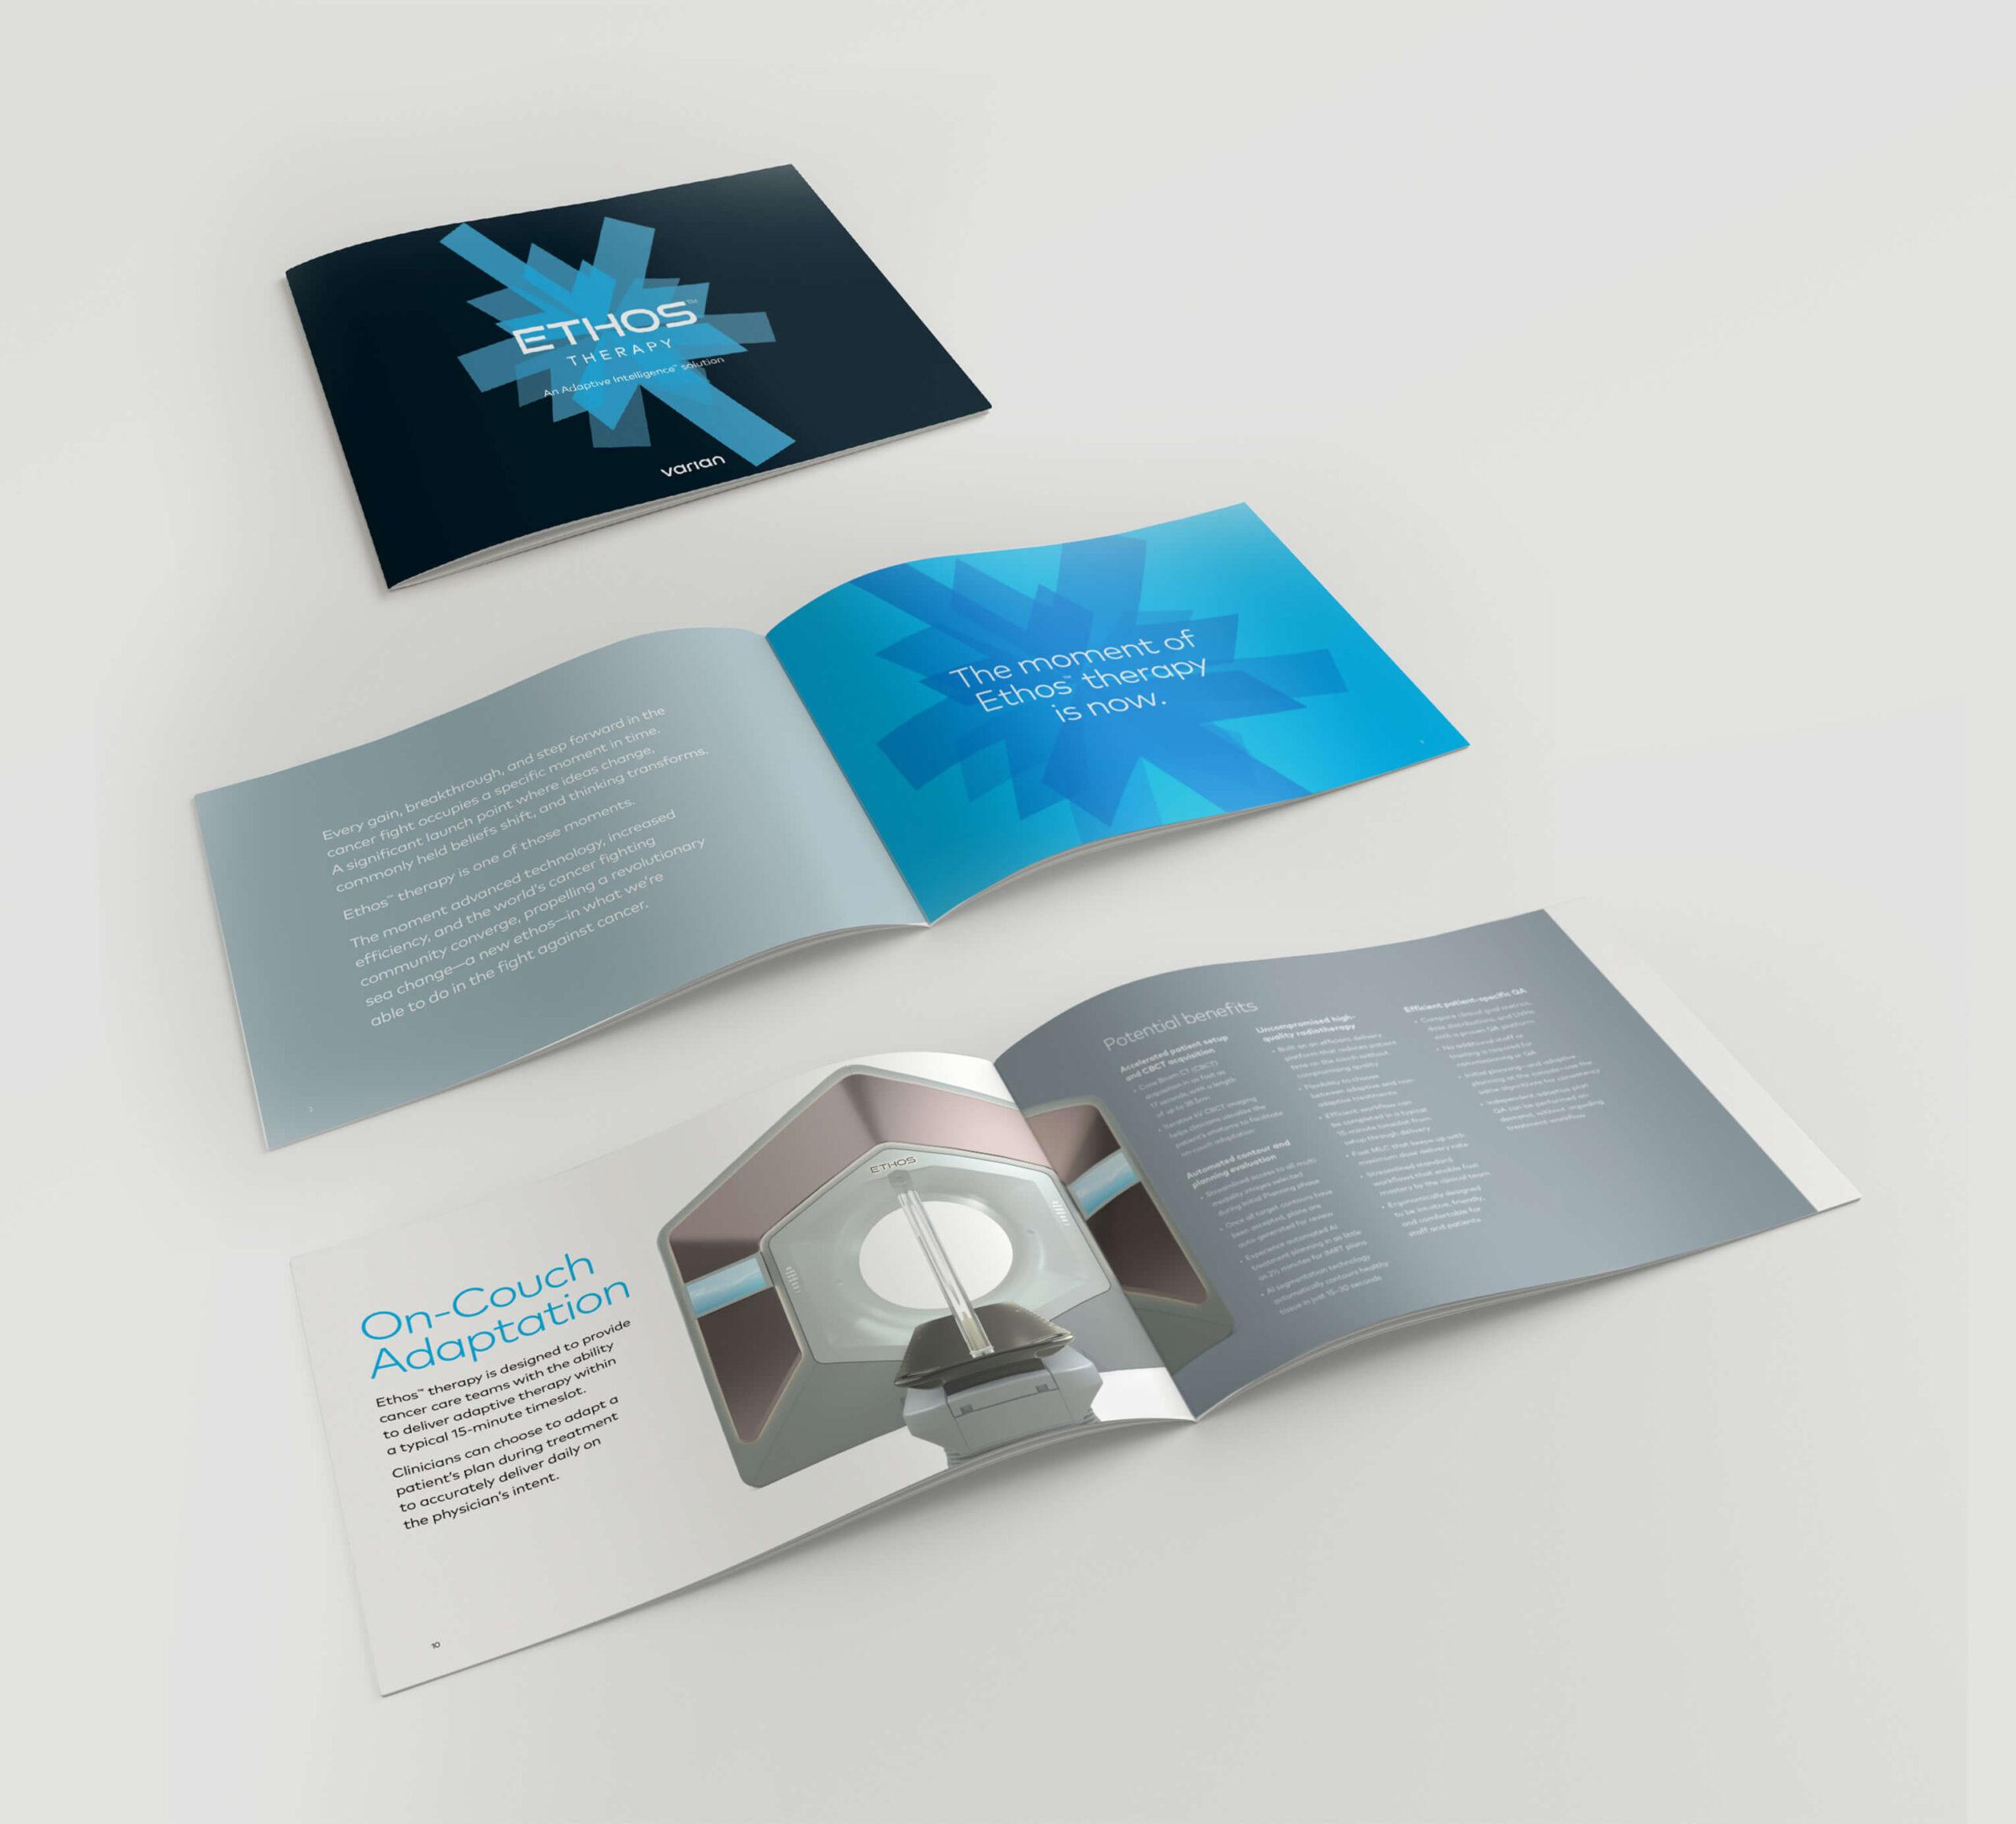 Varian Ethos lookbook